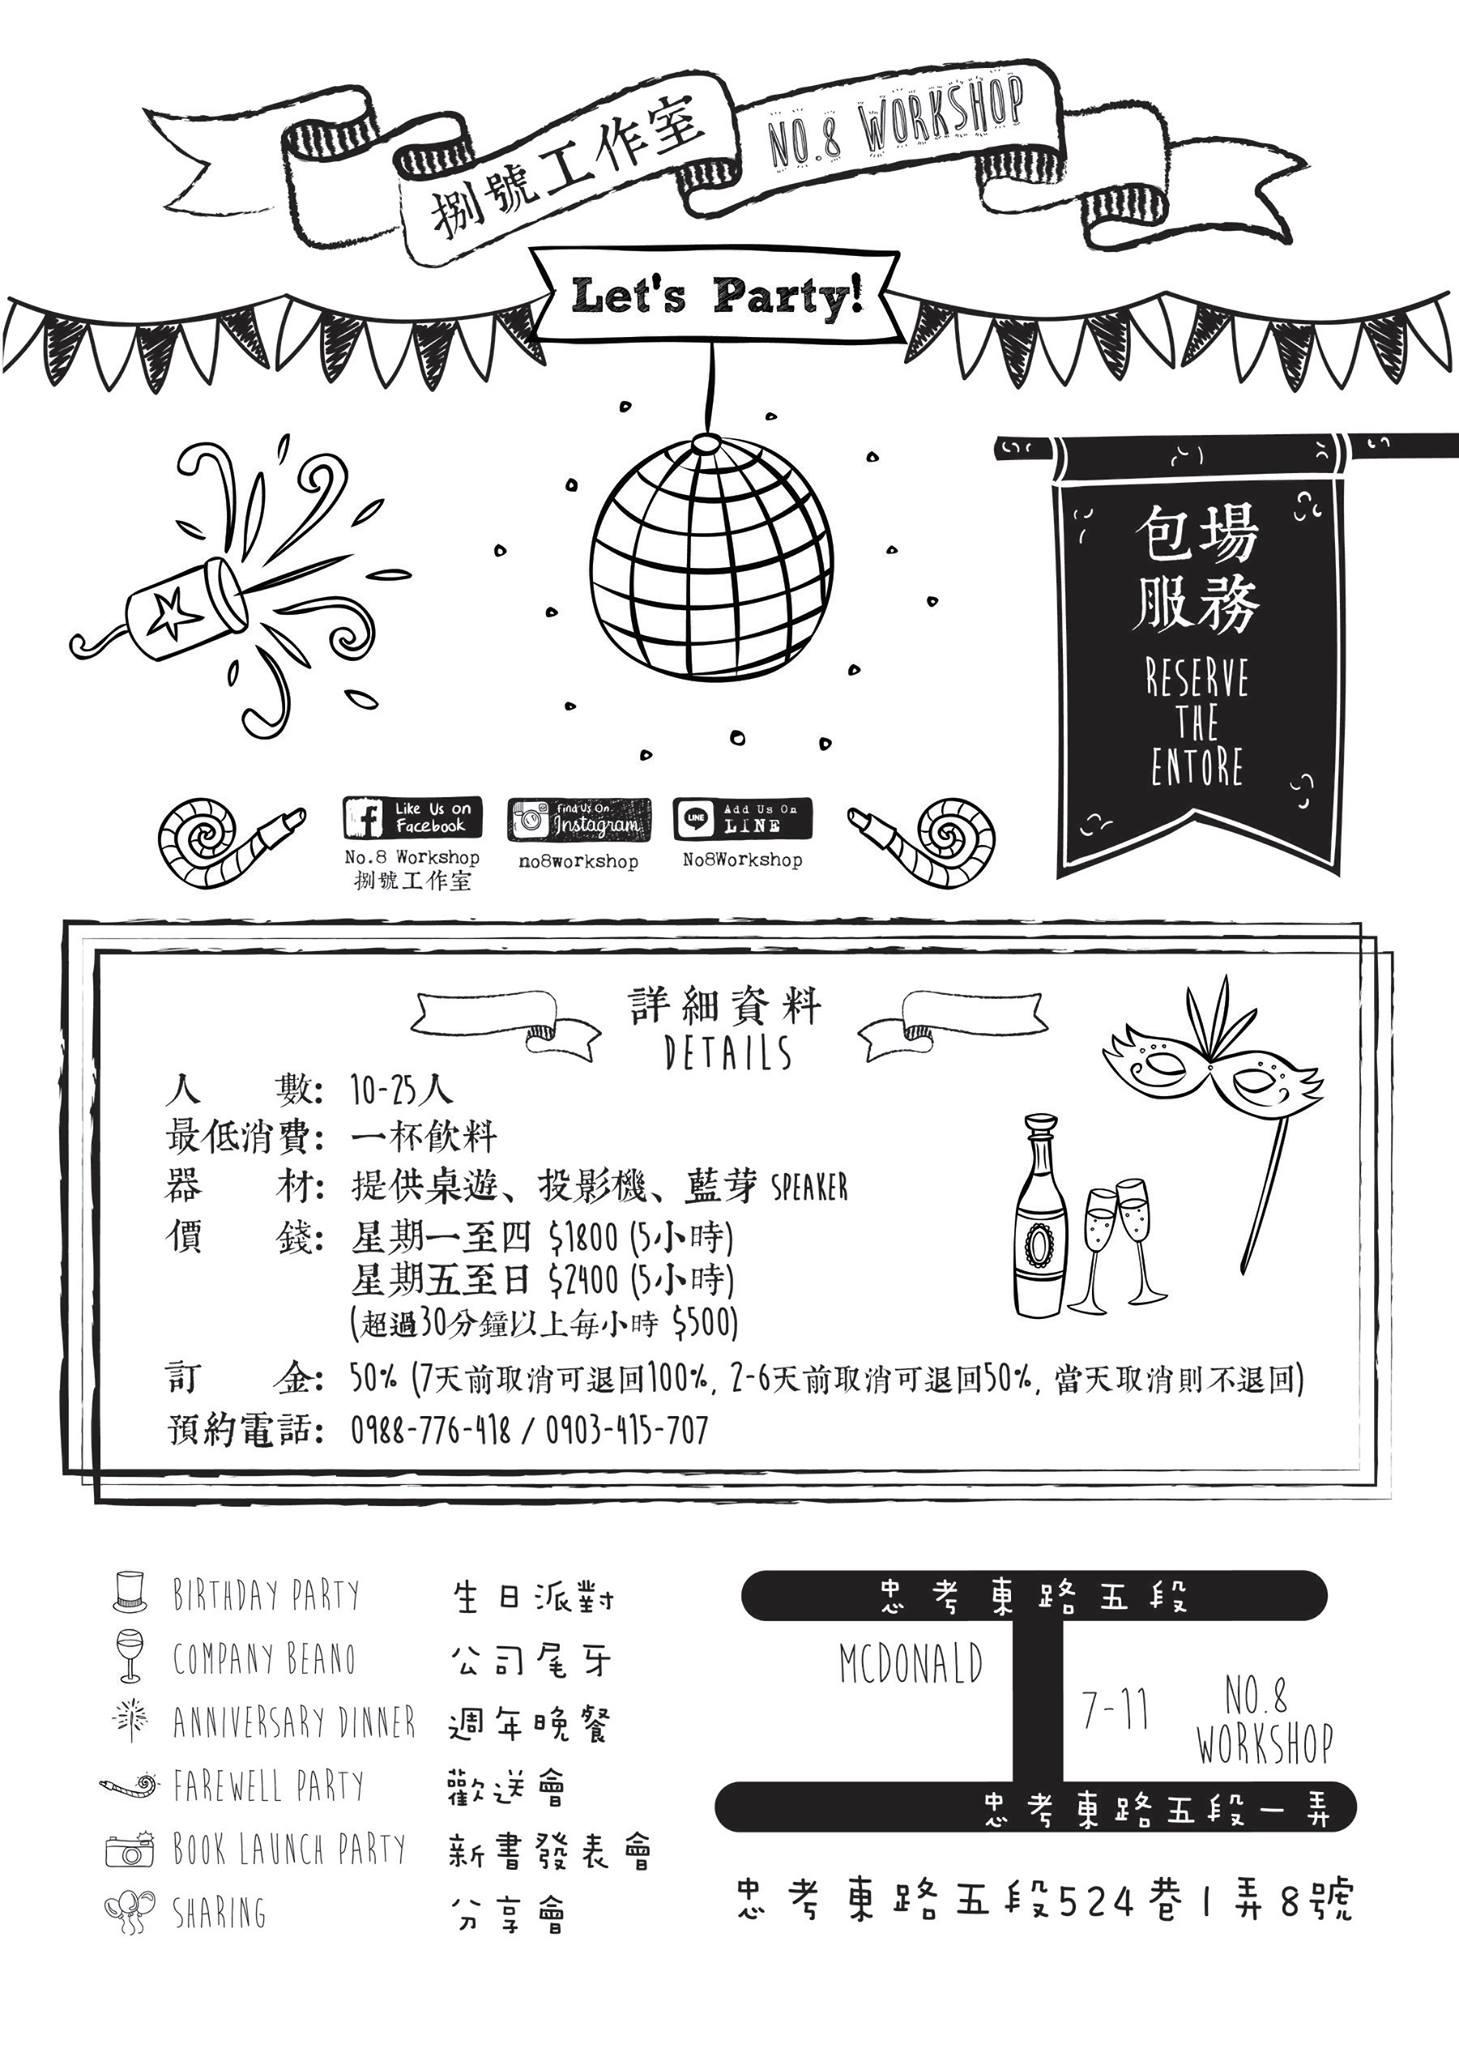 No.8 Workshop 捌號工作室-no8workshop-menu-party